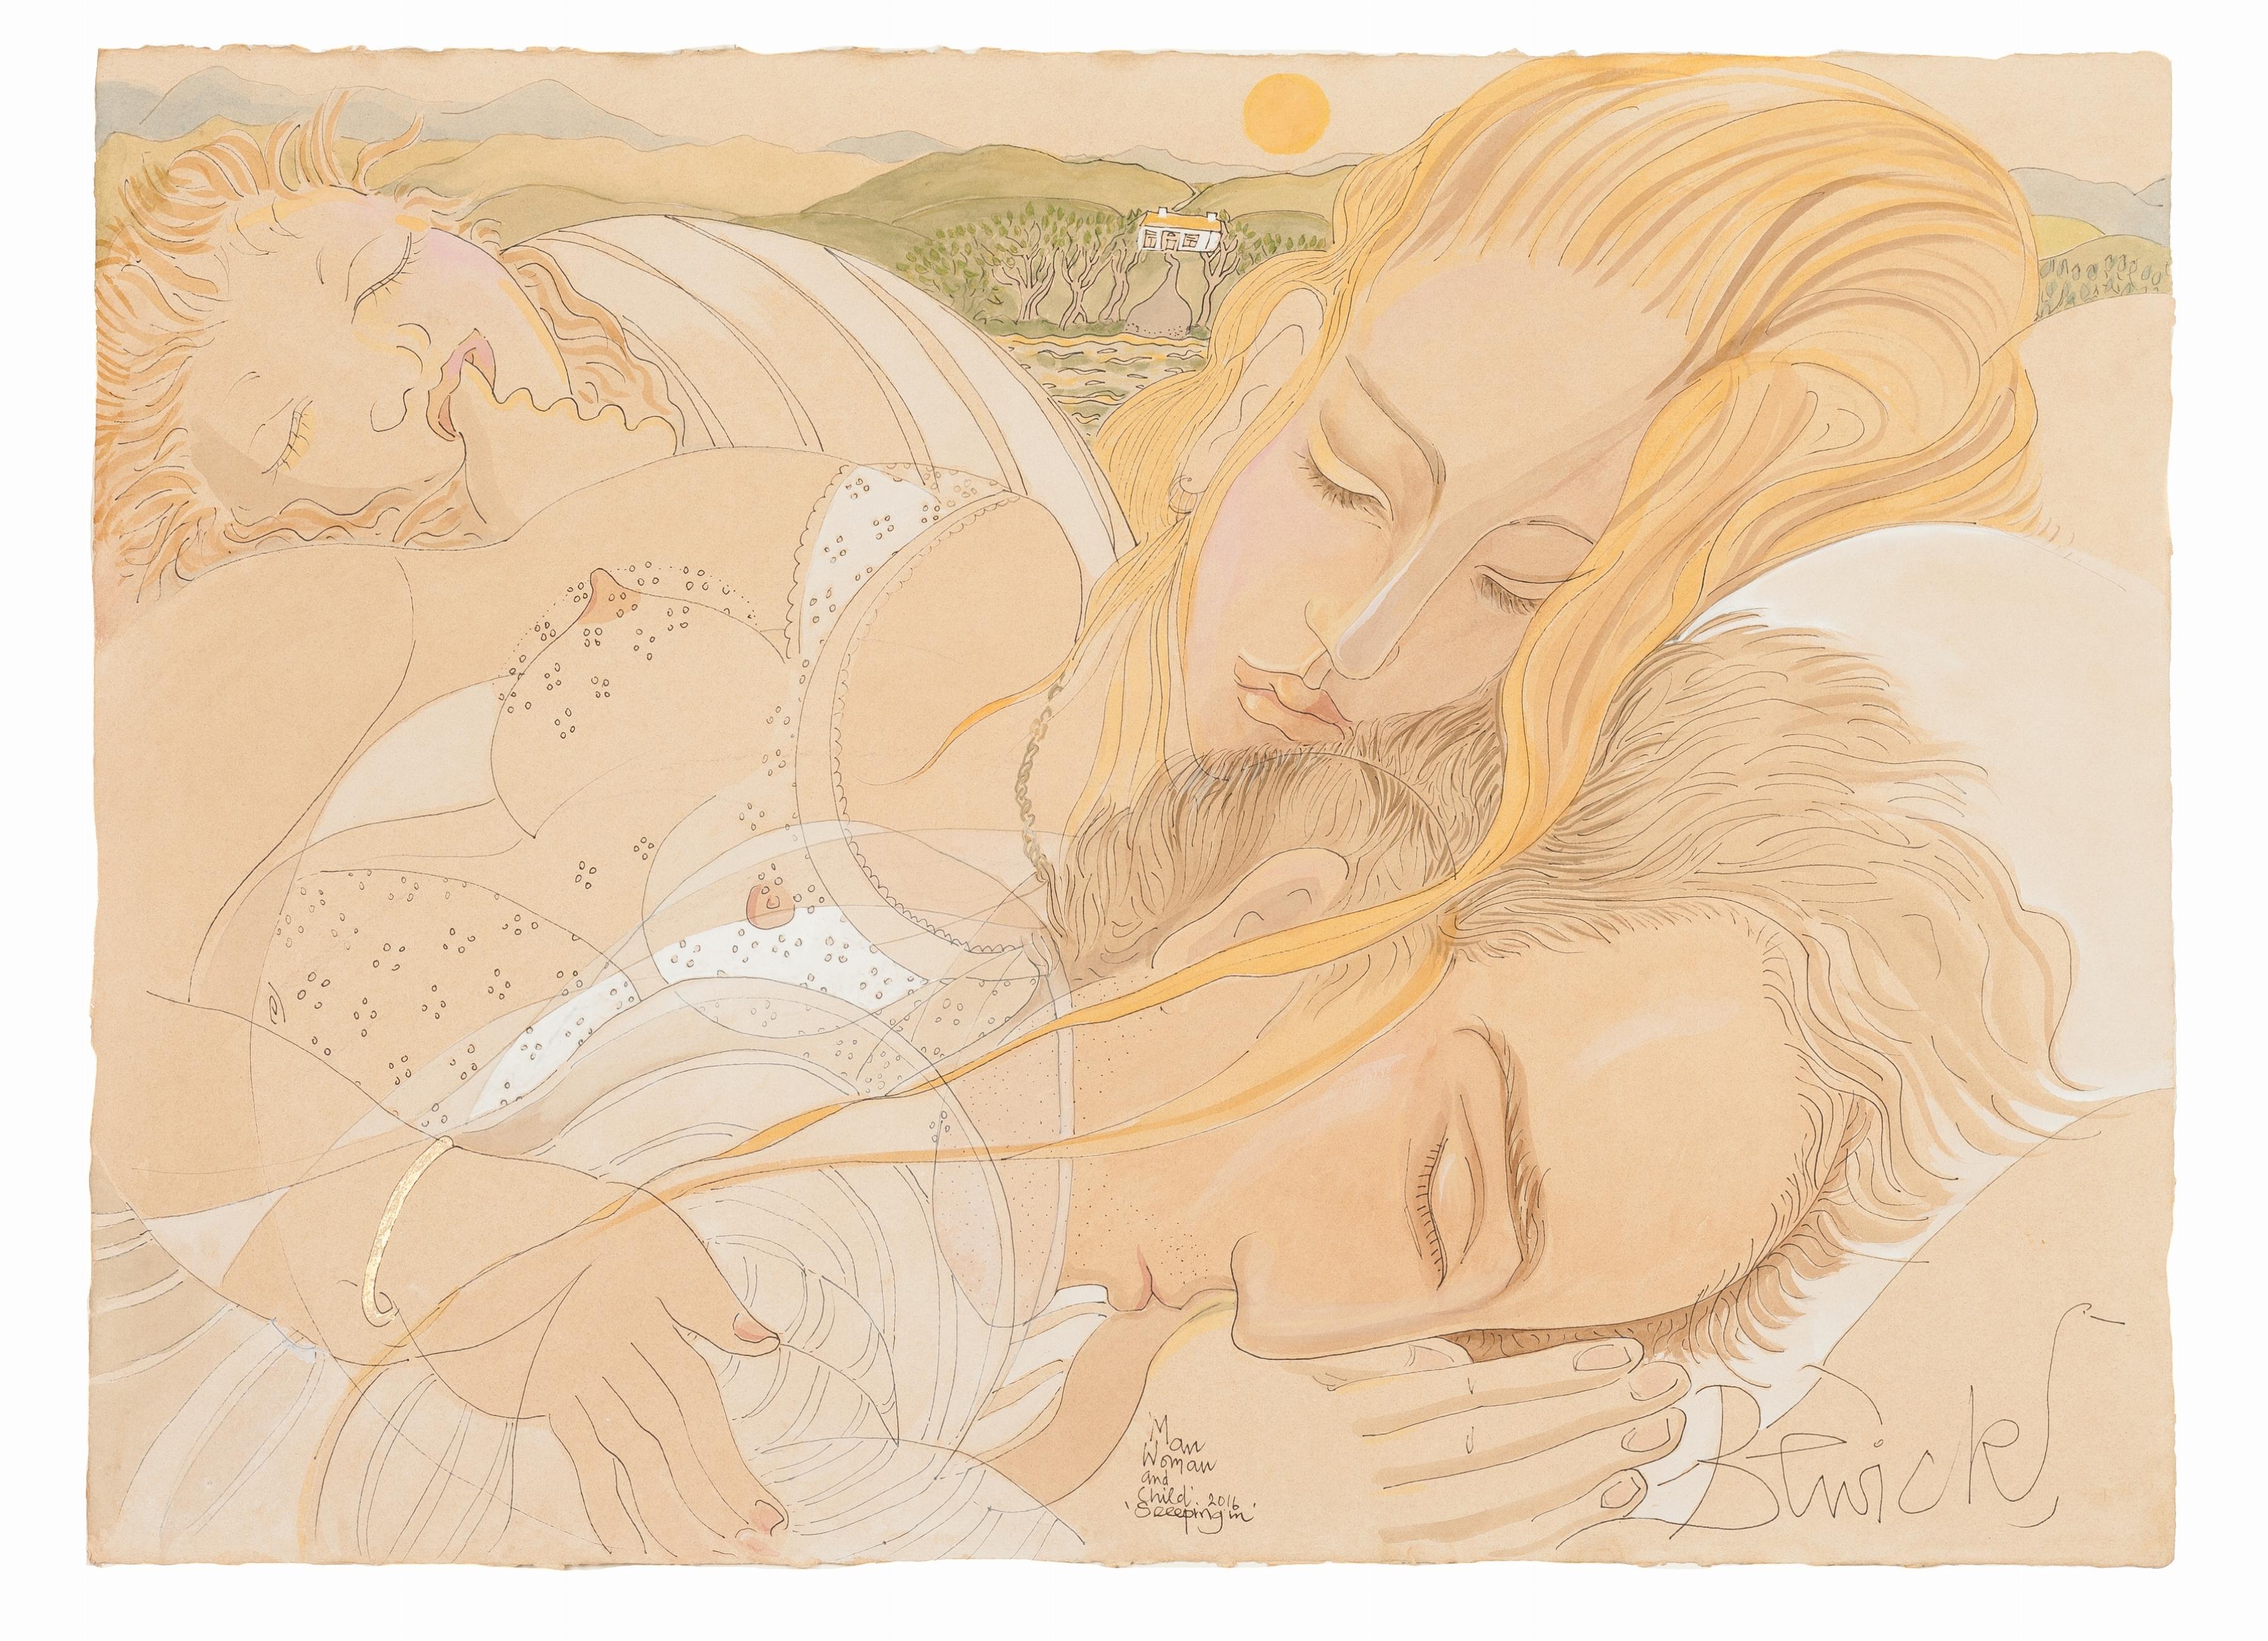 'Man Woman & Child Sleeping 2016' watercolour and acrylic 58cm x 79cm - £12,800